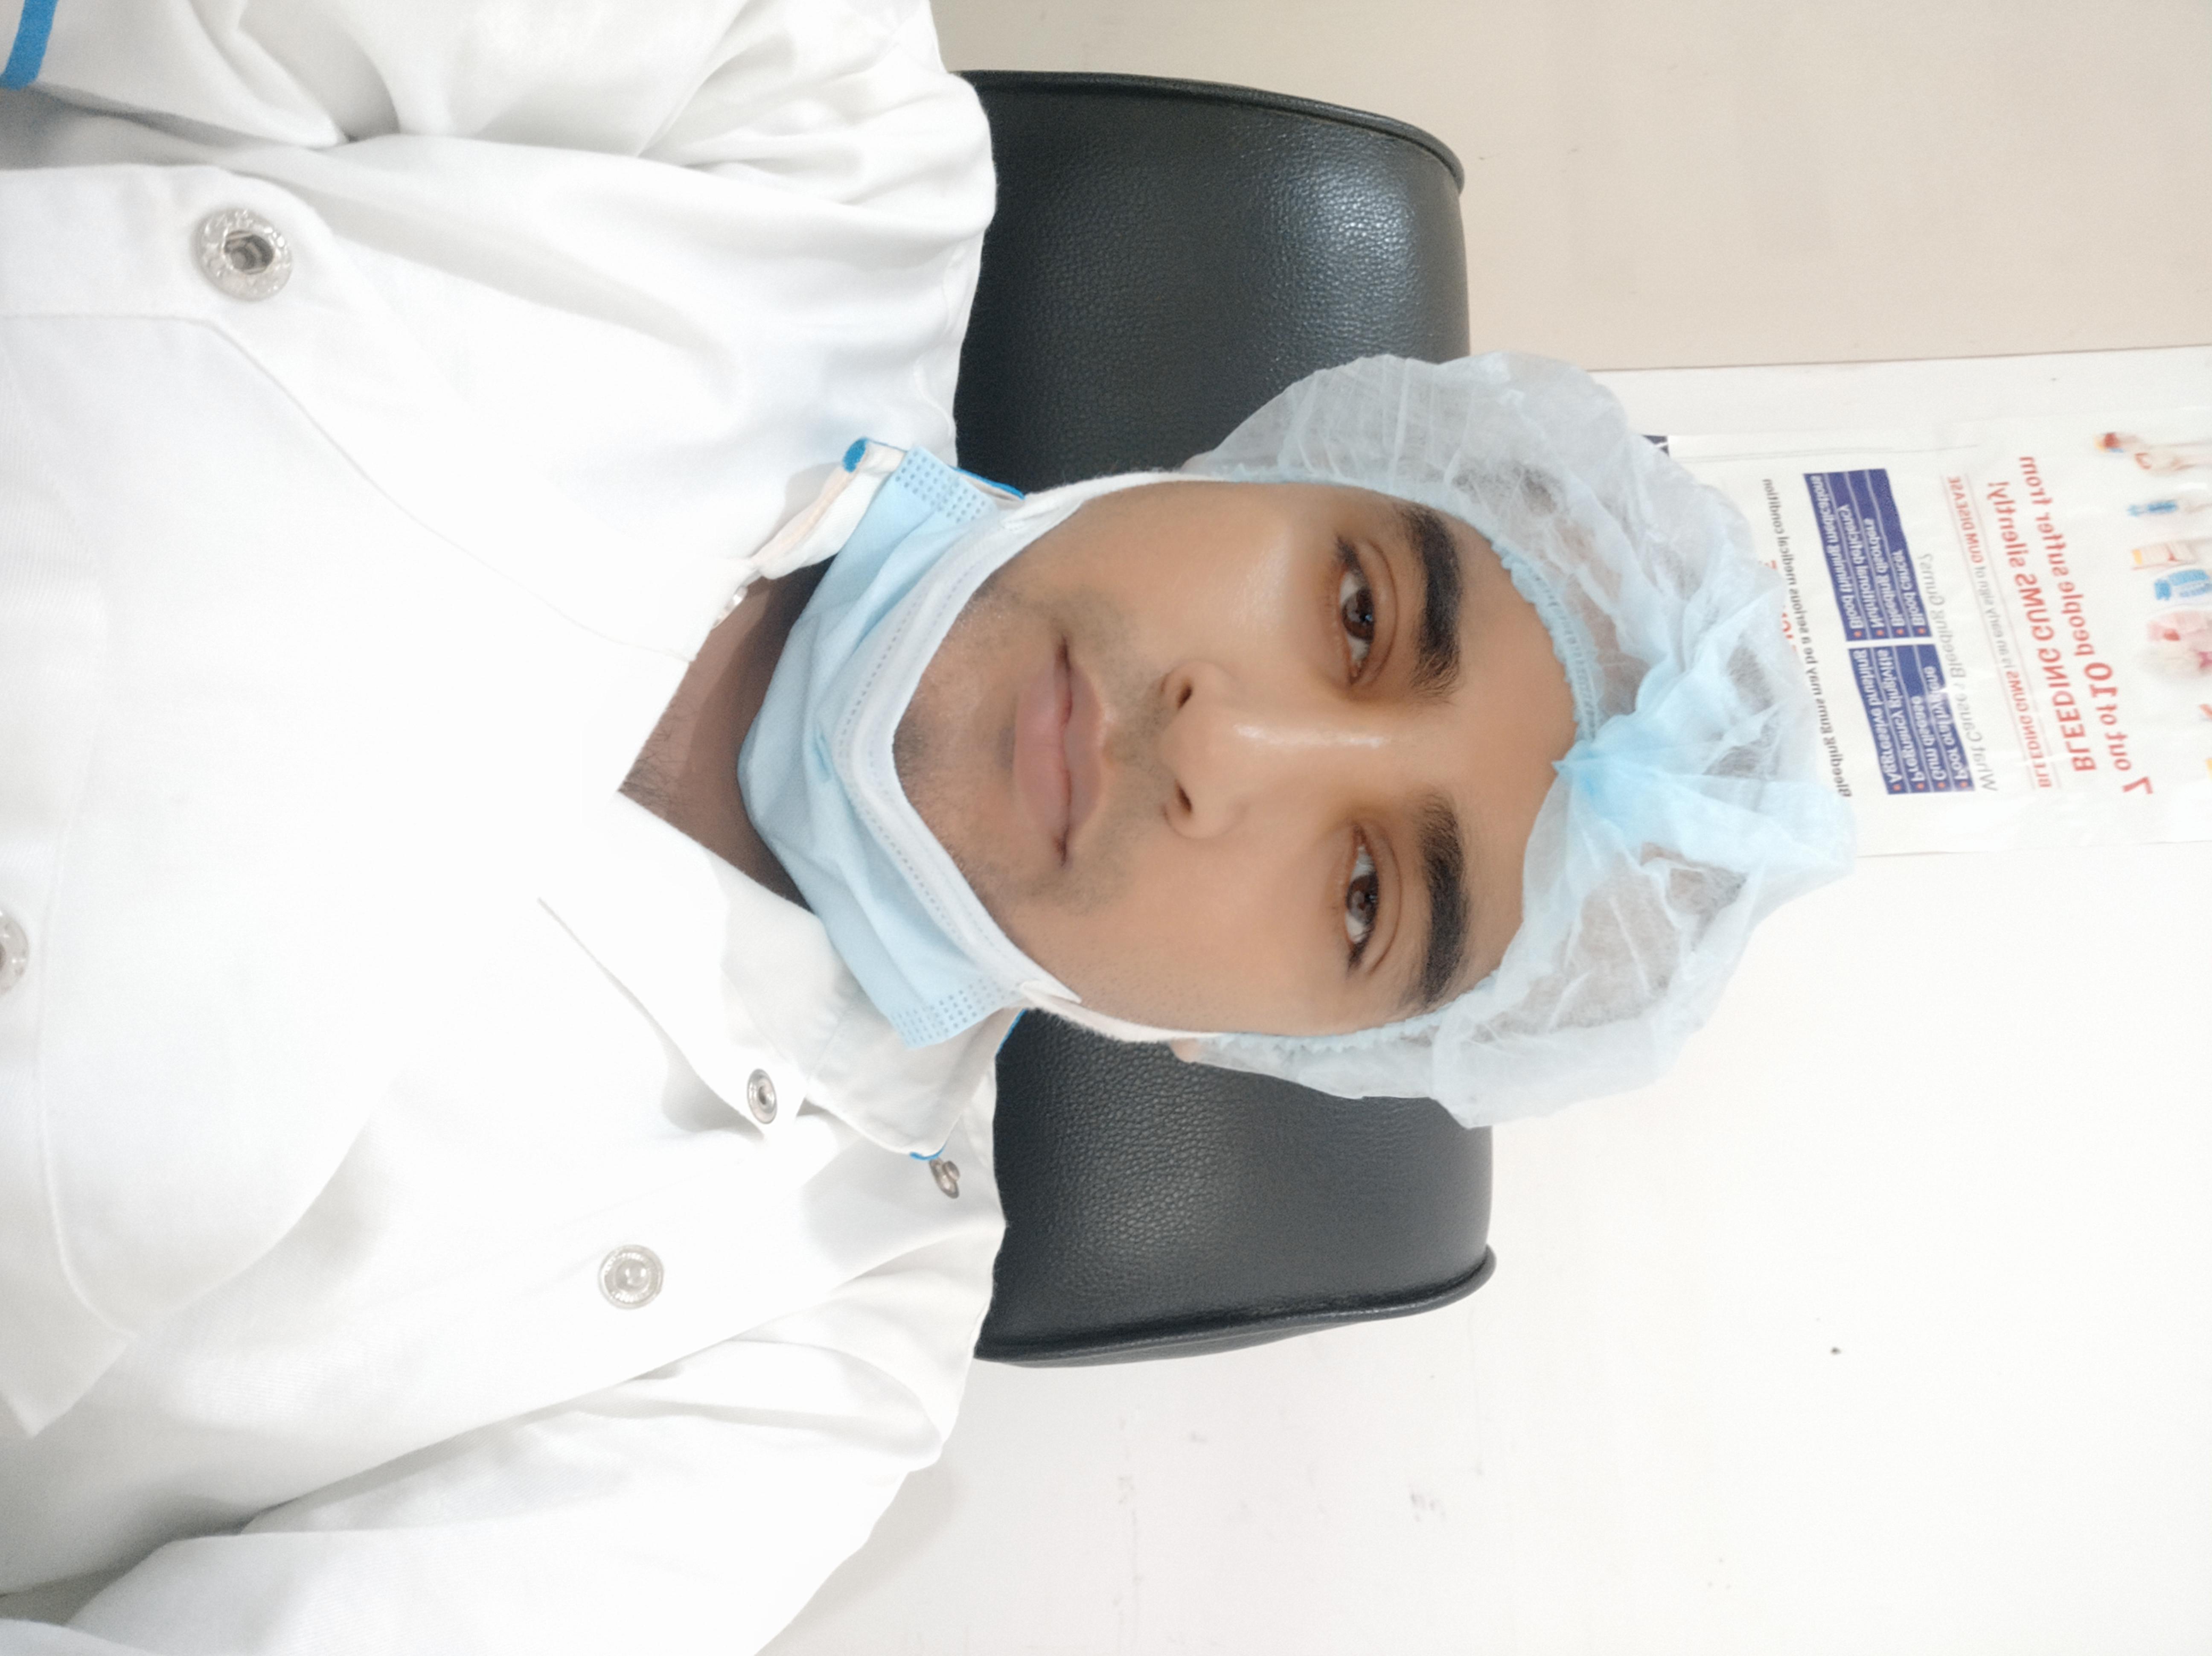 Dr. Krishna Singh